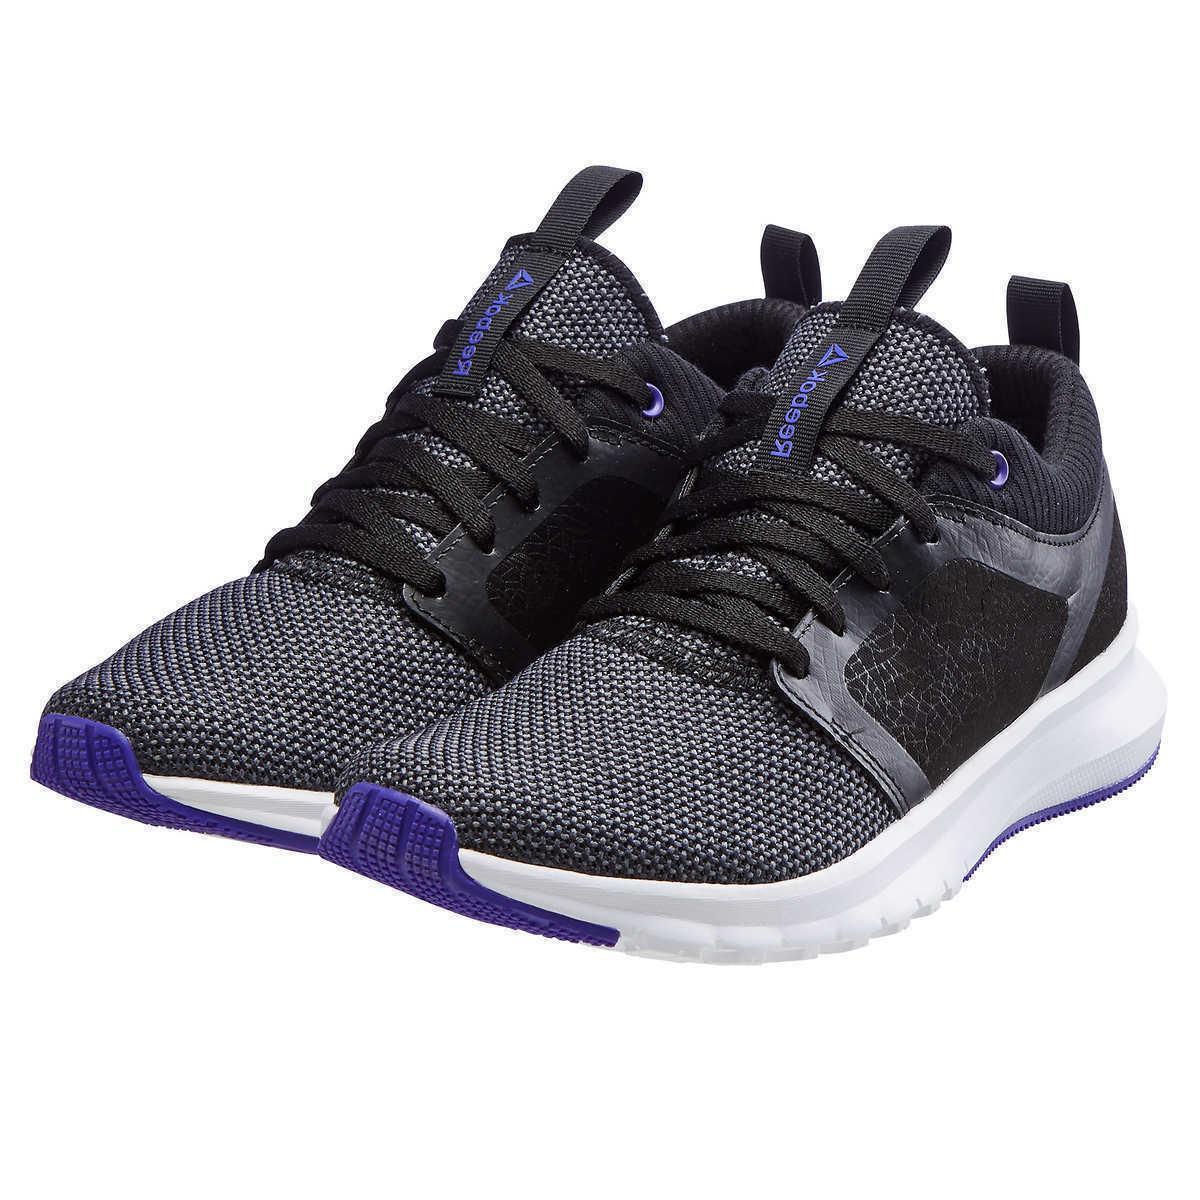 NEW Reebok Print Athlux Shatr Women's Running Shoes- Black P